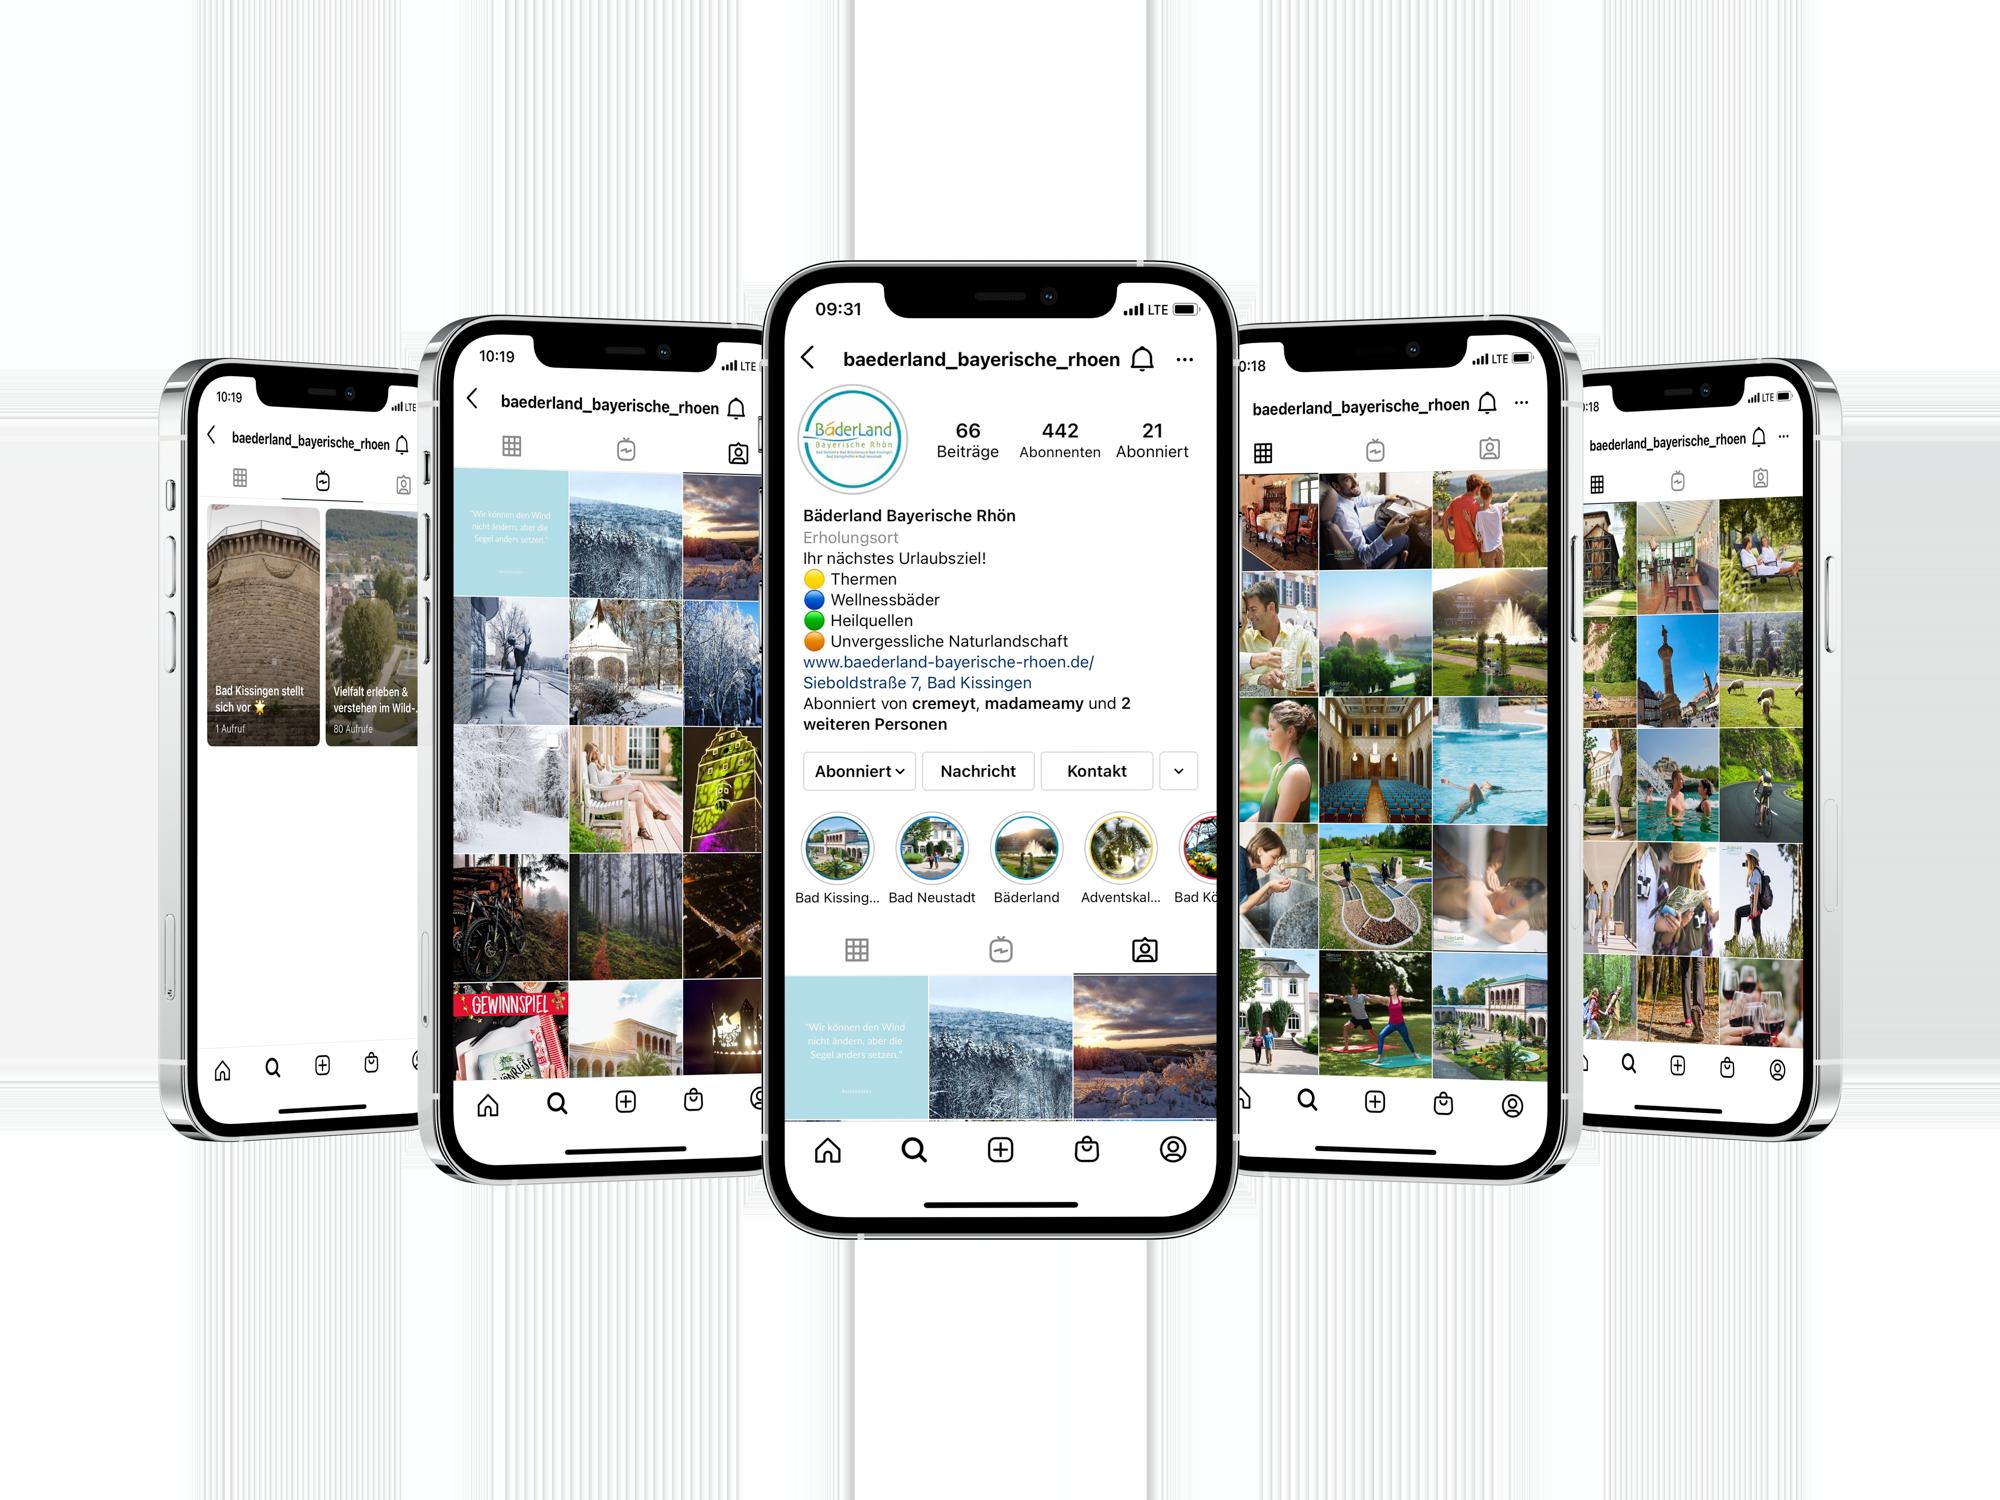 I Phone Mockup Baederland | MedienMacher